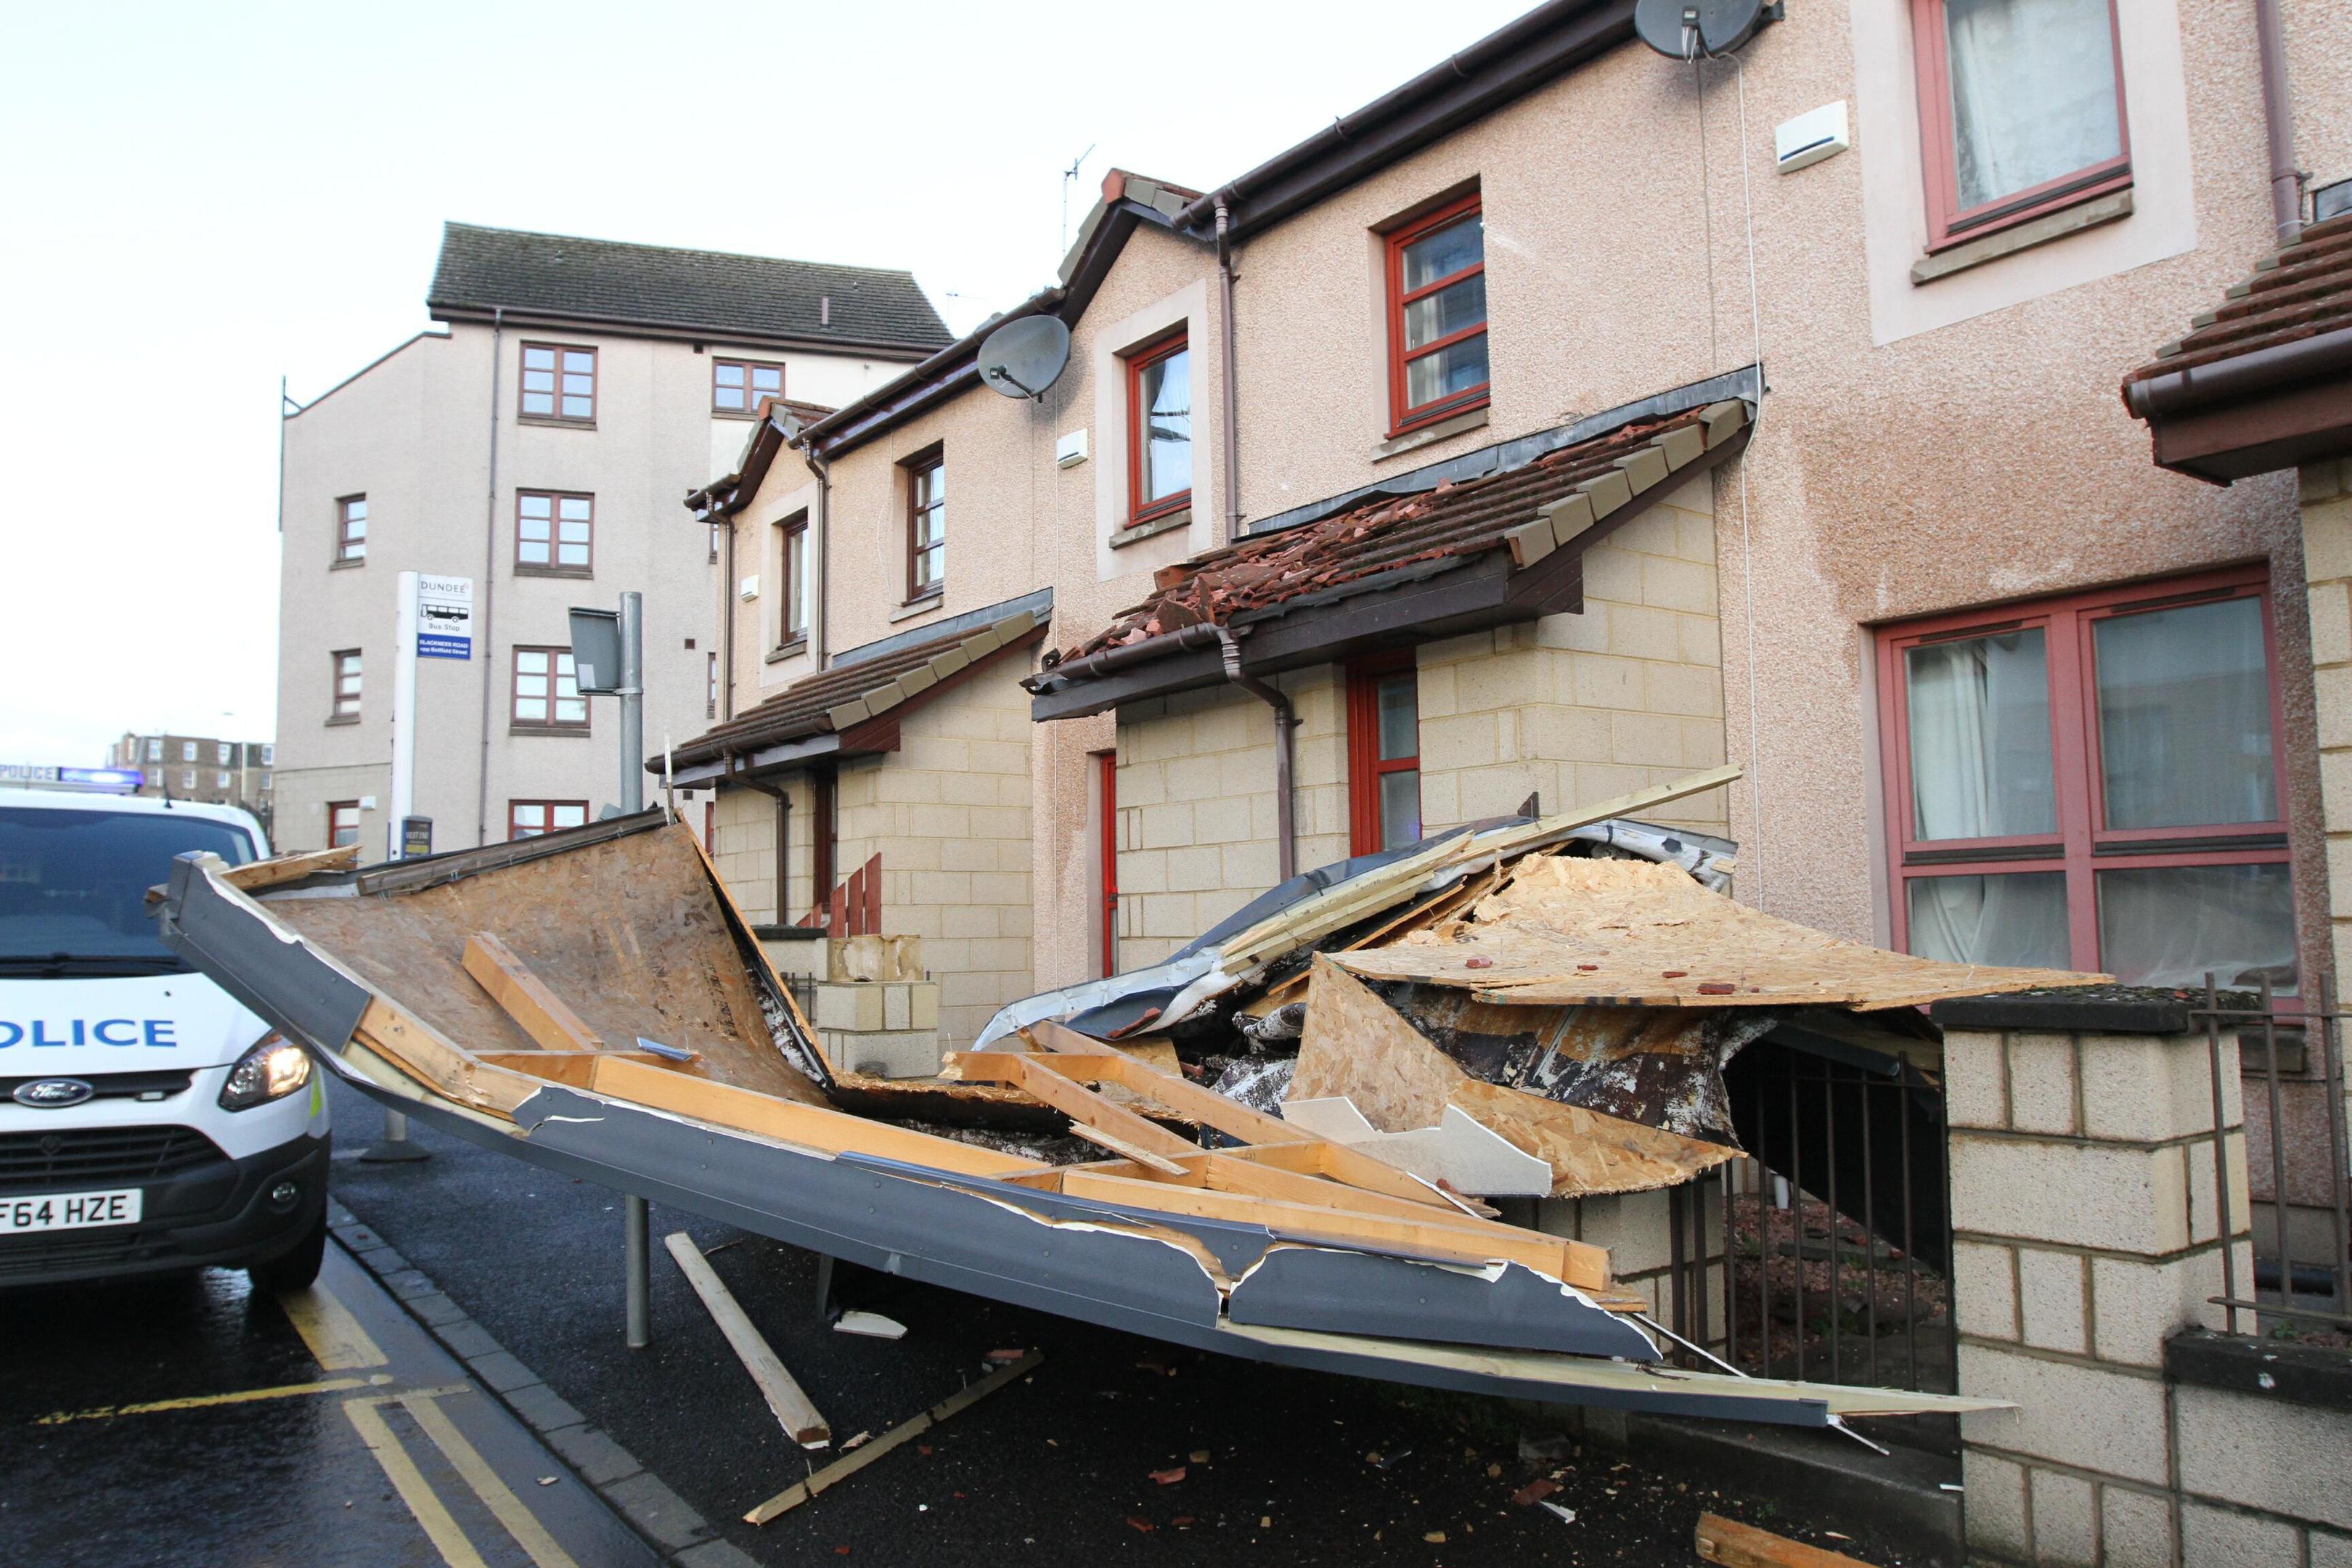 Police survey the damage at Blackness Road